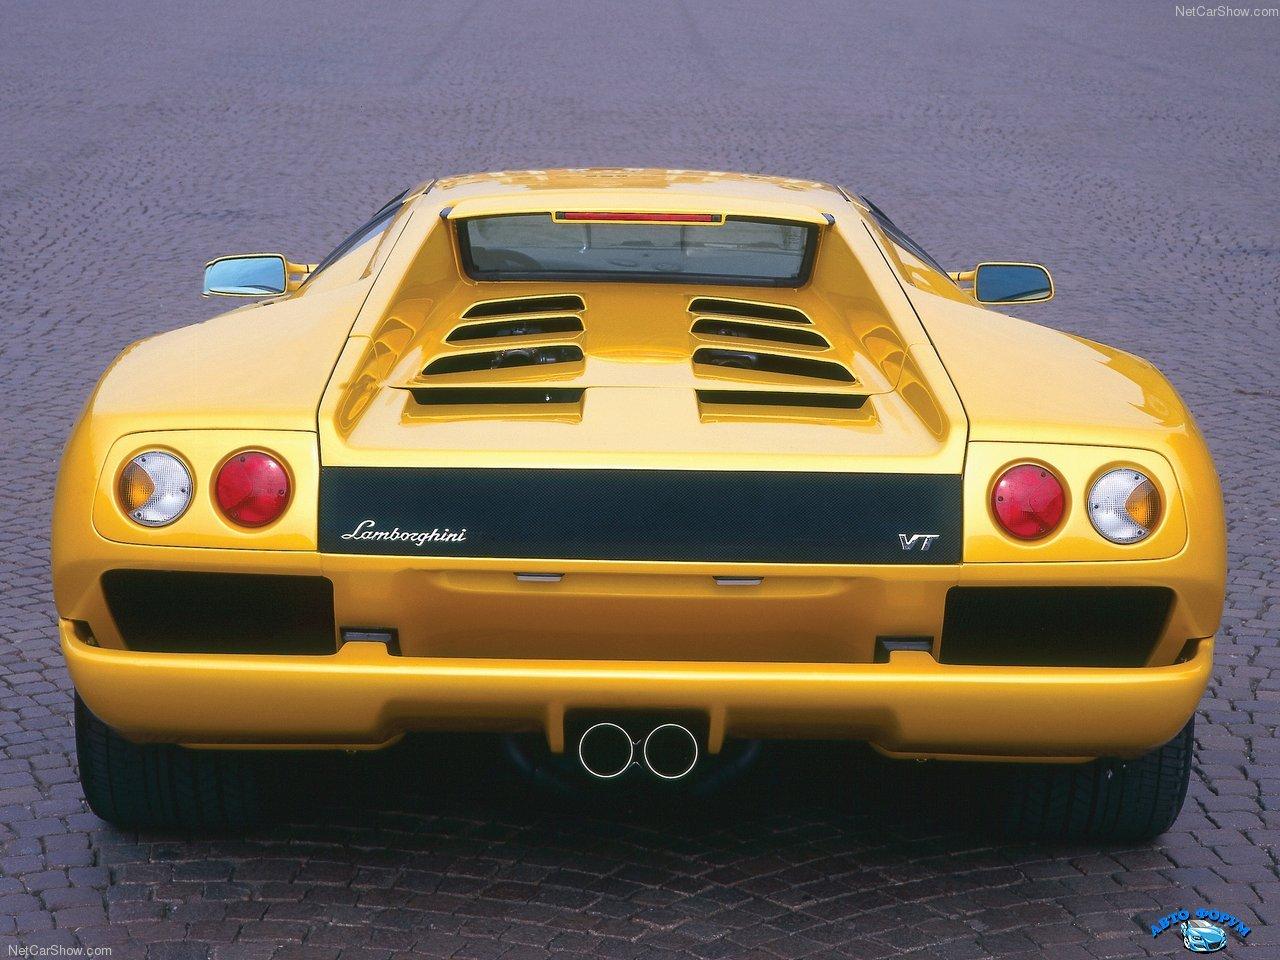 Lamborghini-Diablo_6.0_2001_1280x960_wallpaper_08.jpg